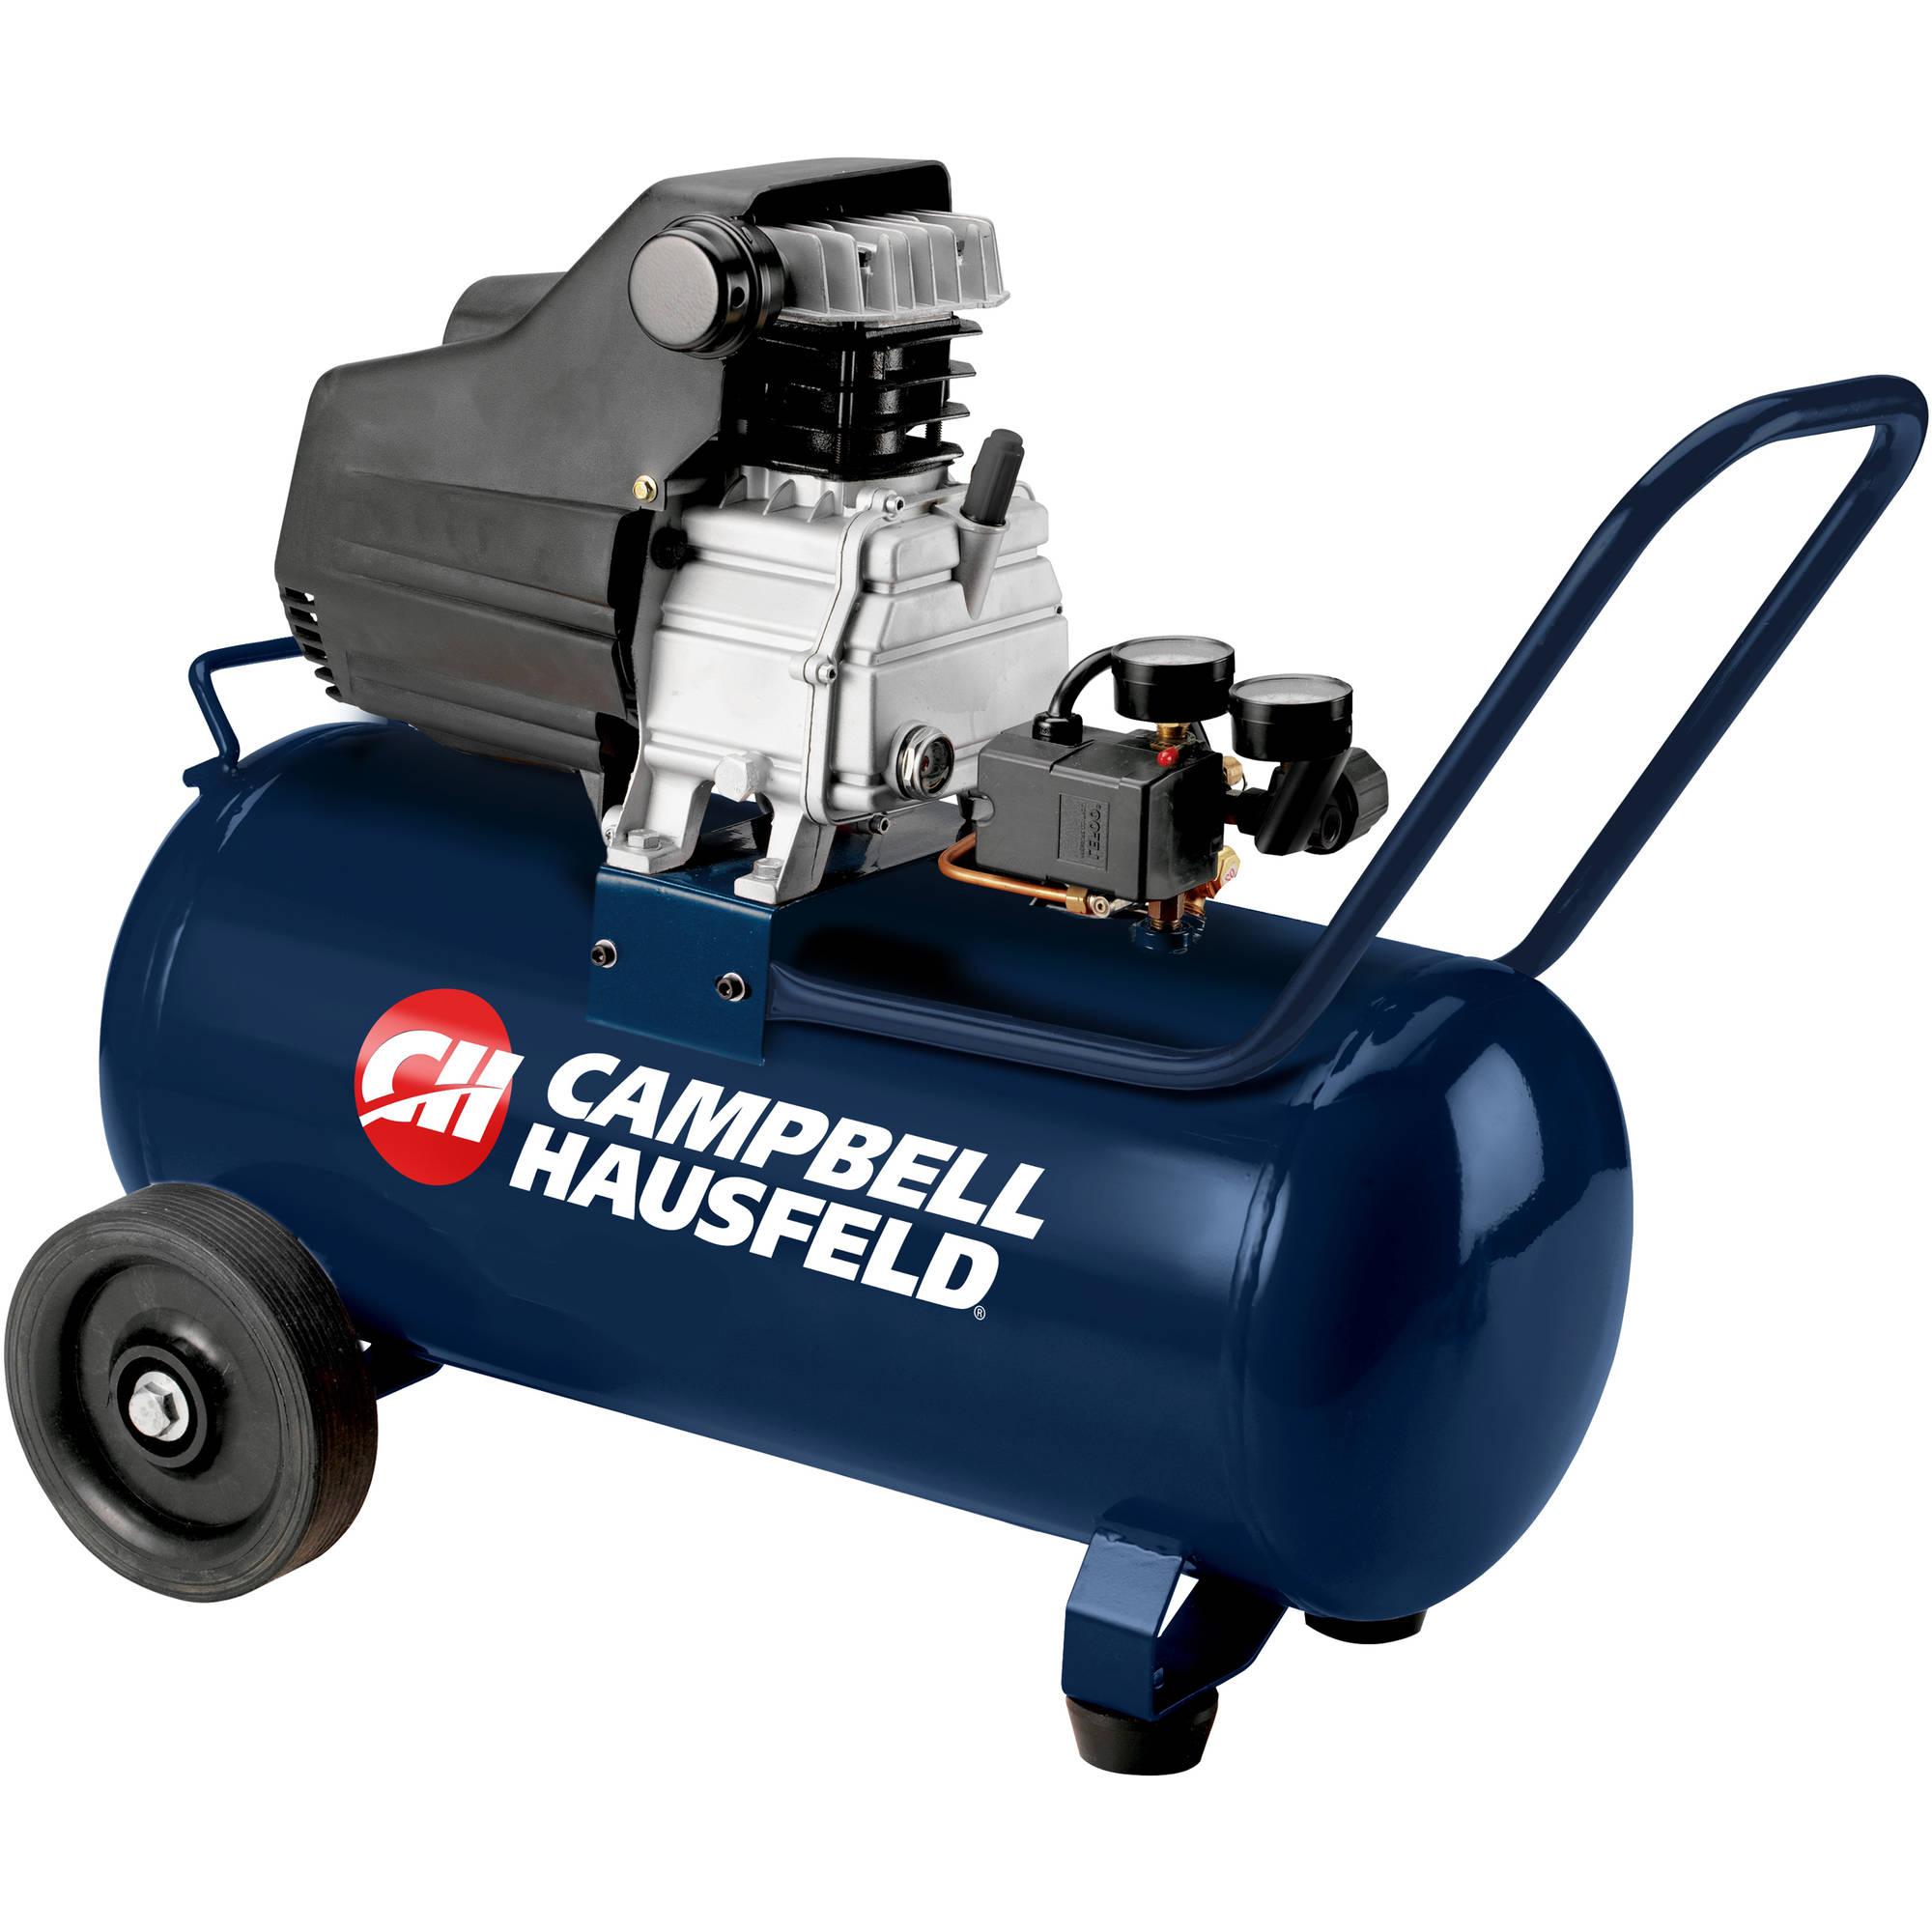 Campbell Hausfeld Air Compressor Wl604006af : Campbell hausfeld g horizontal tank oil lube air